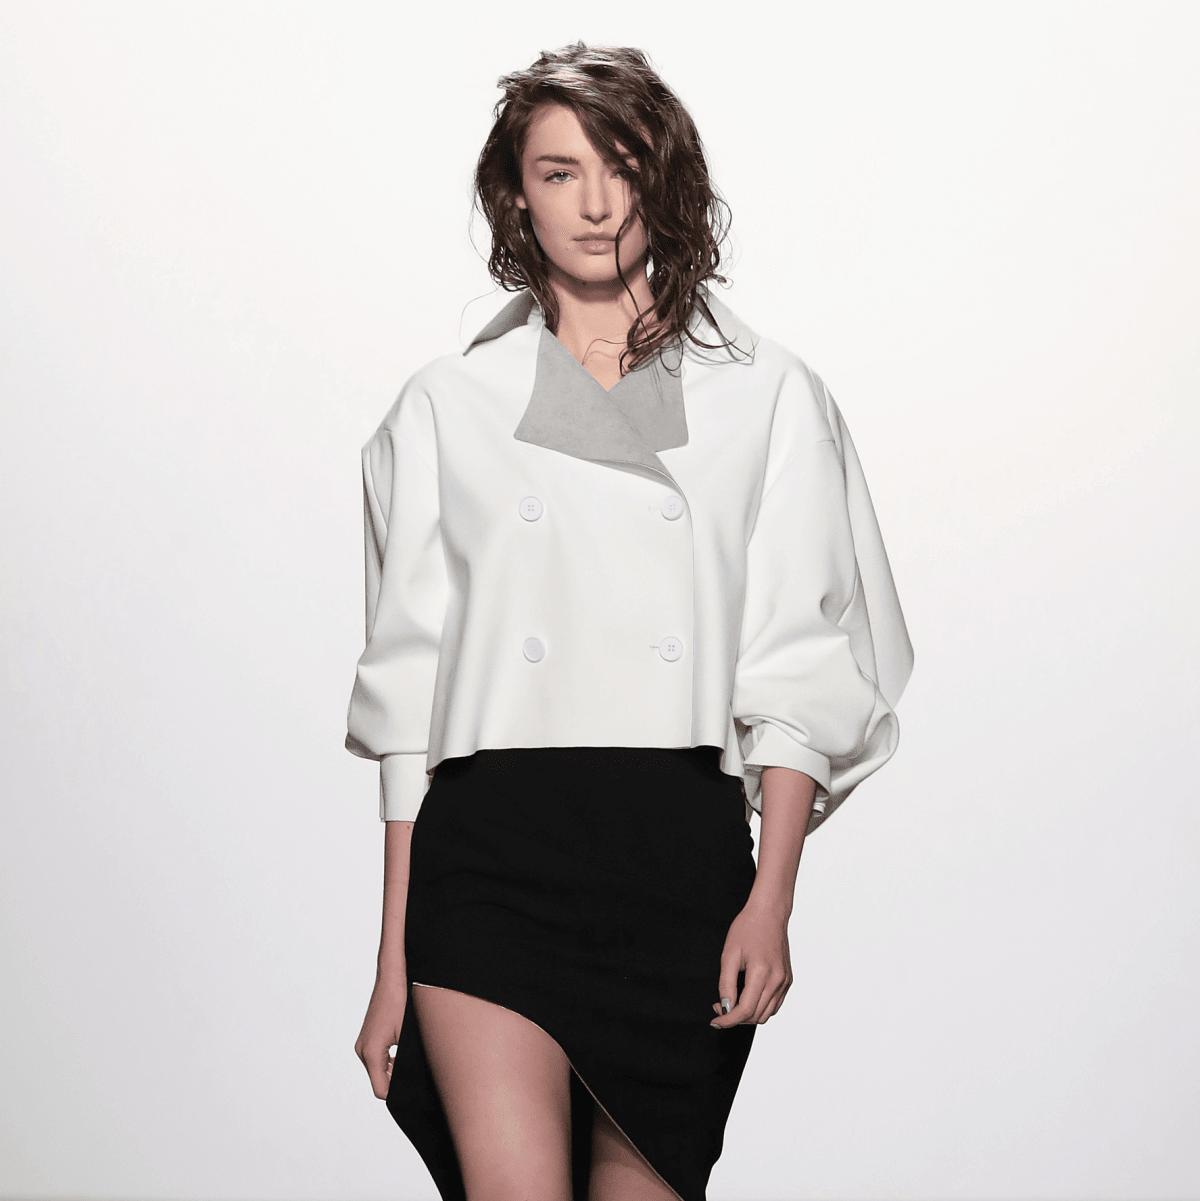 Taoray Wang fall 2017 collection